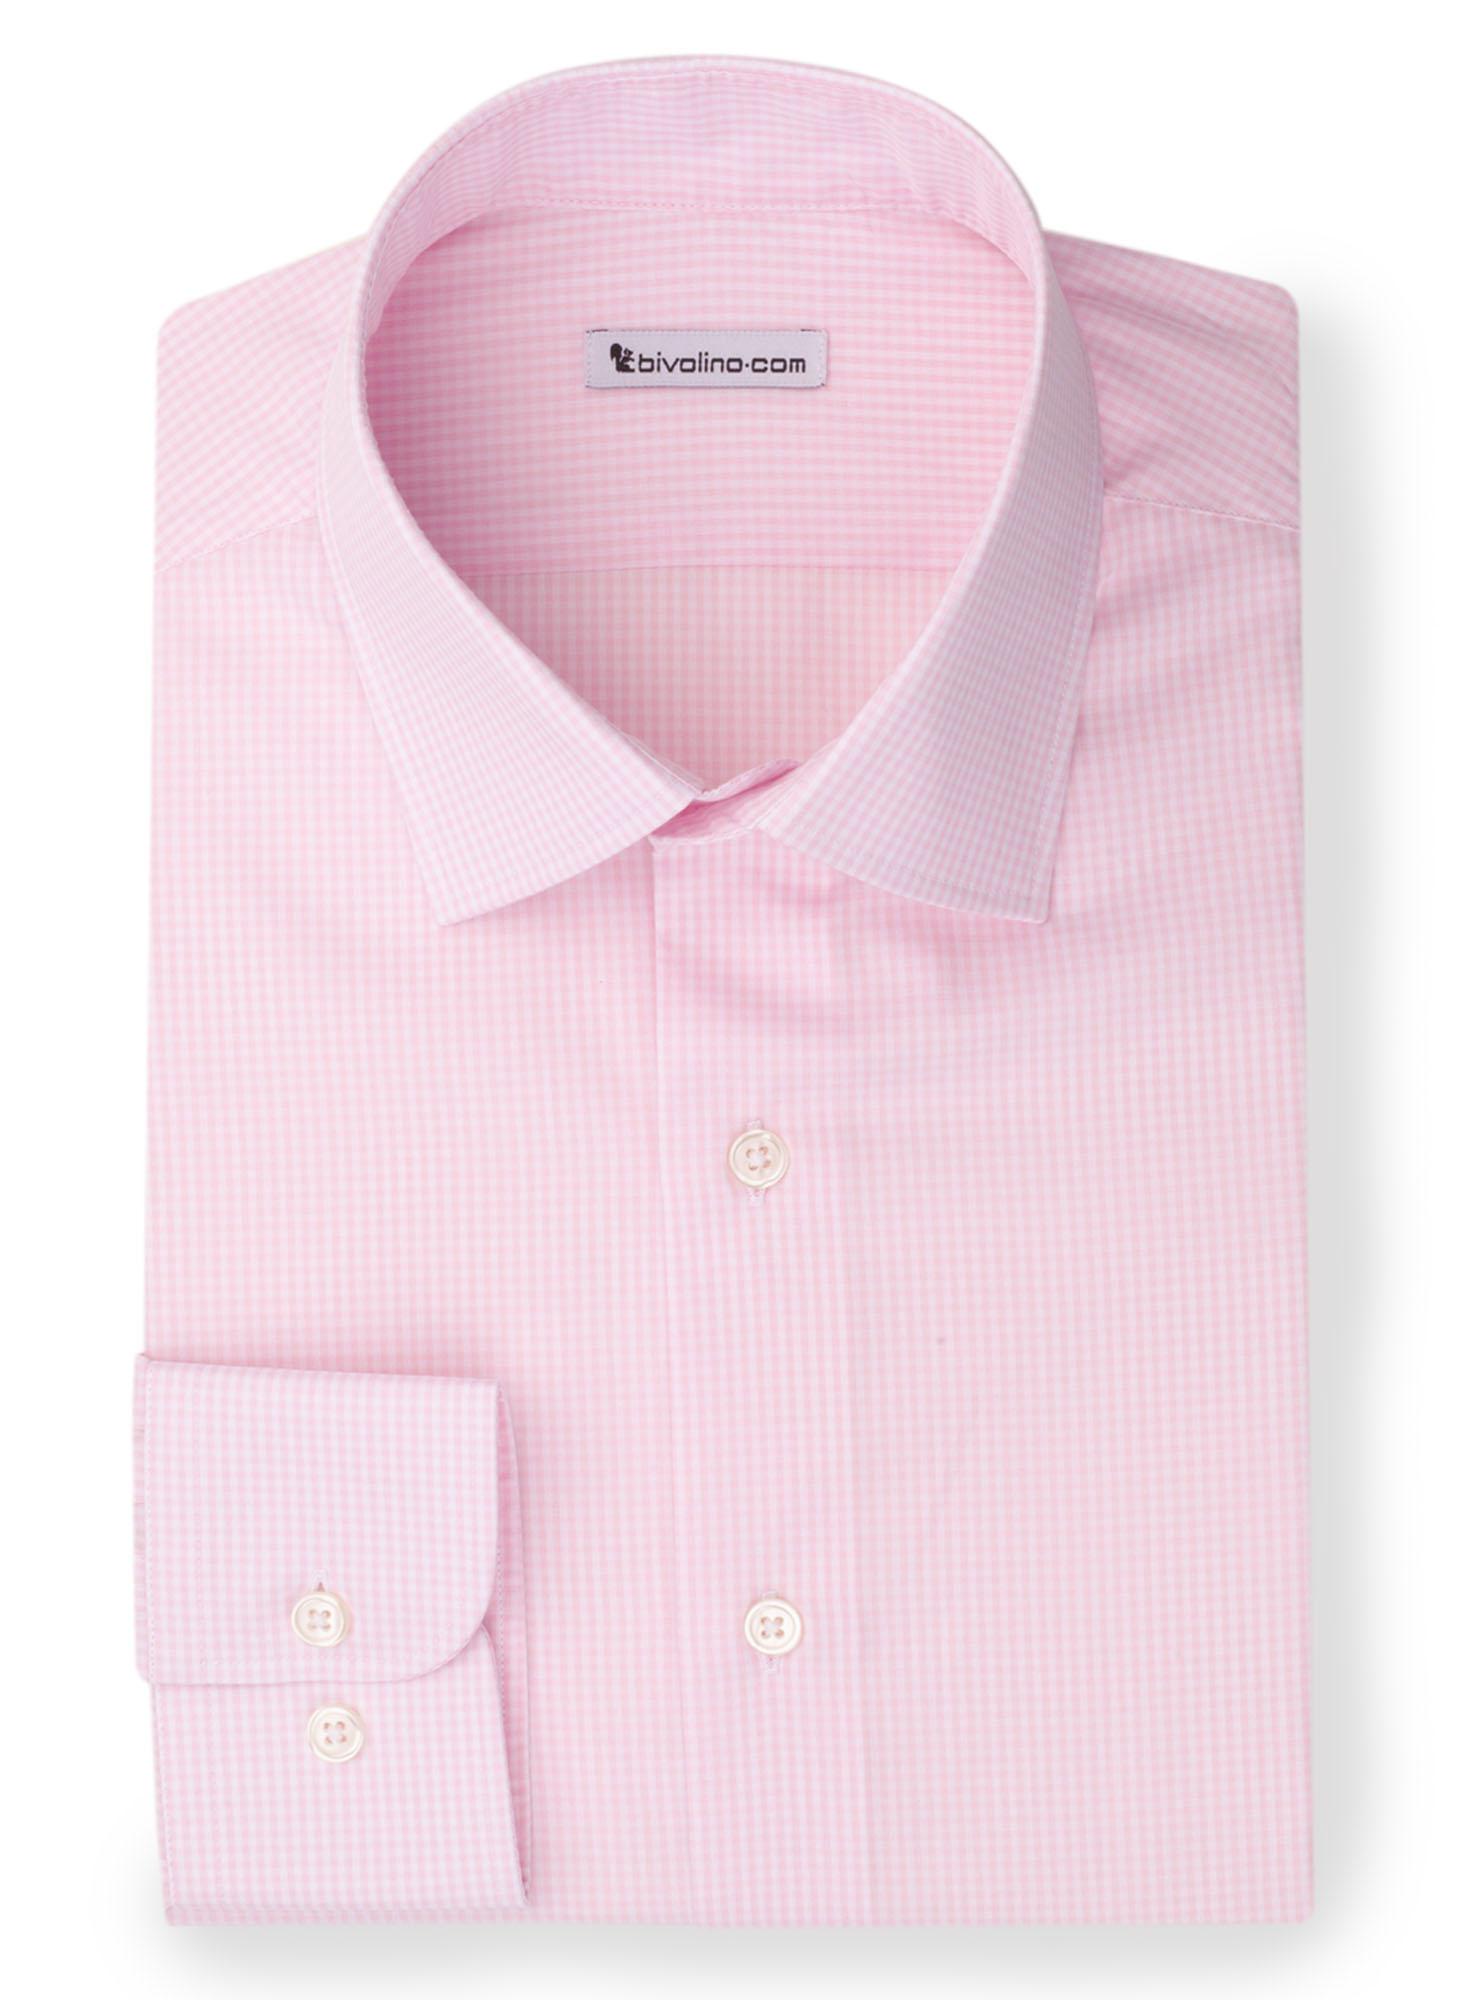 BOLIVICINI -  pink poplin gingham shirt - Kento 1